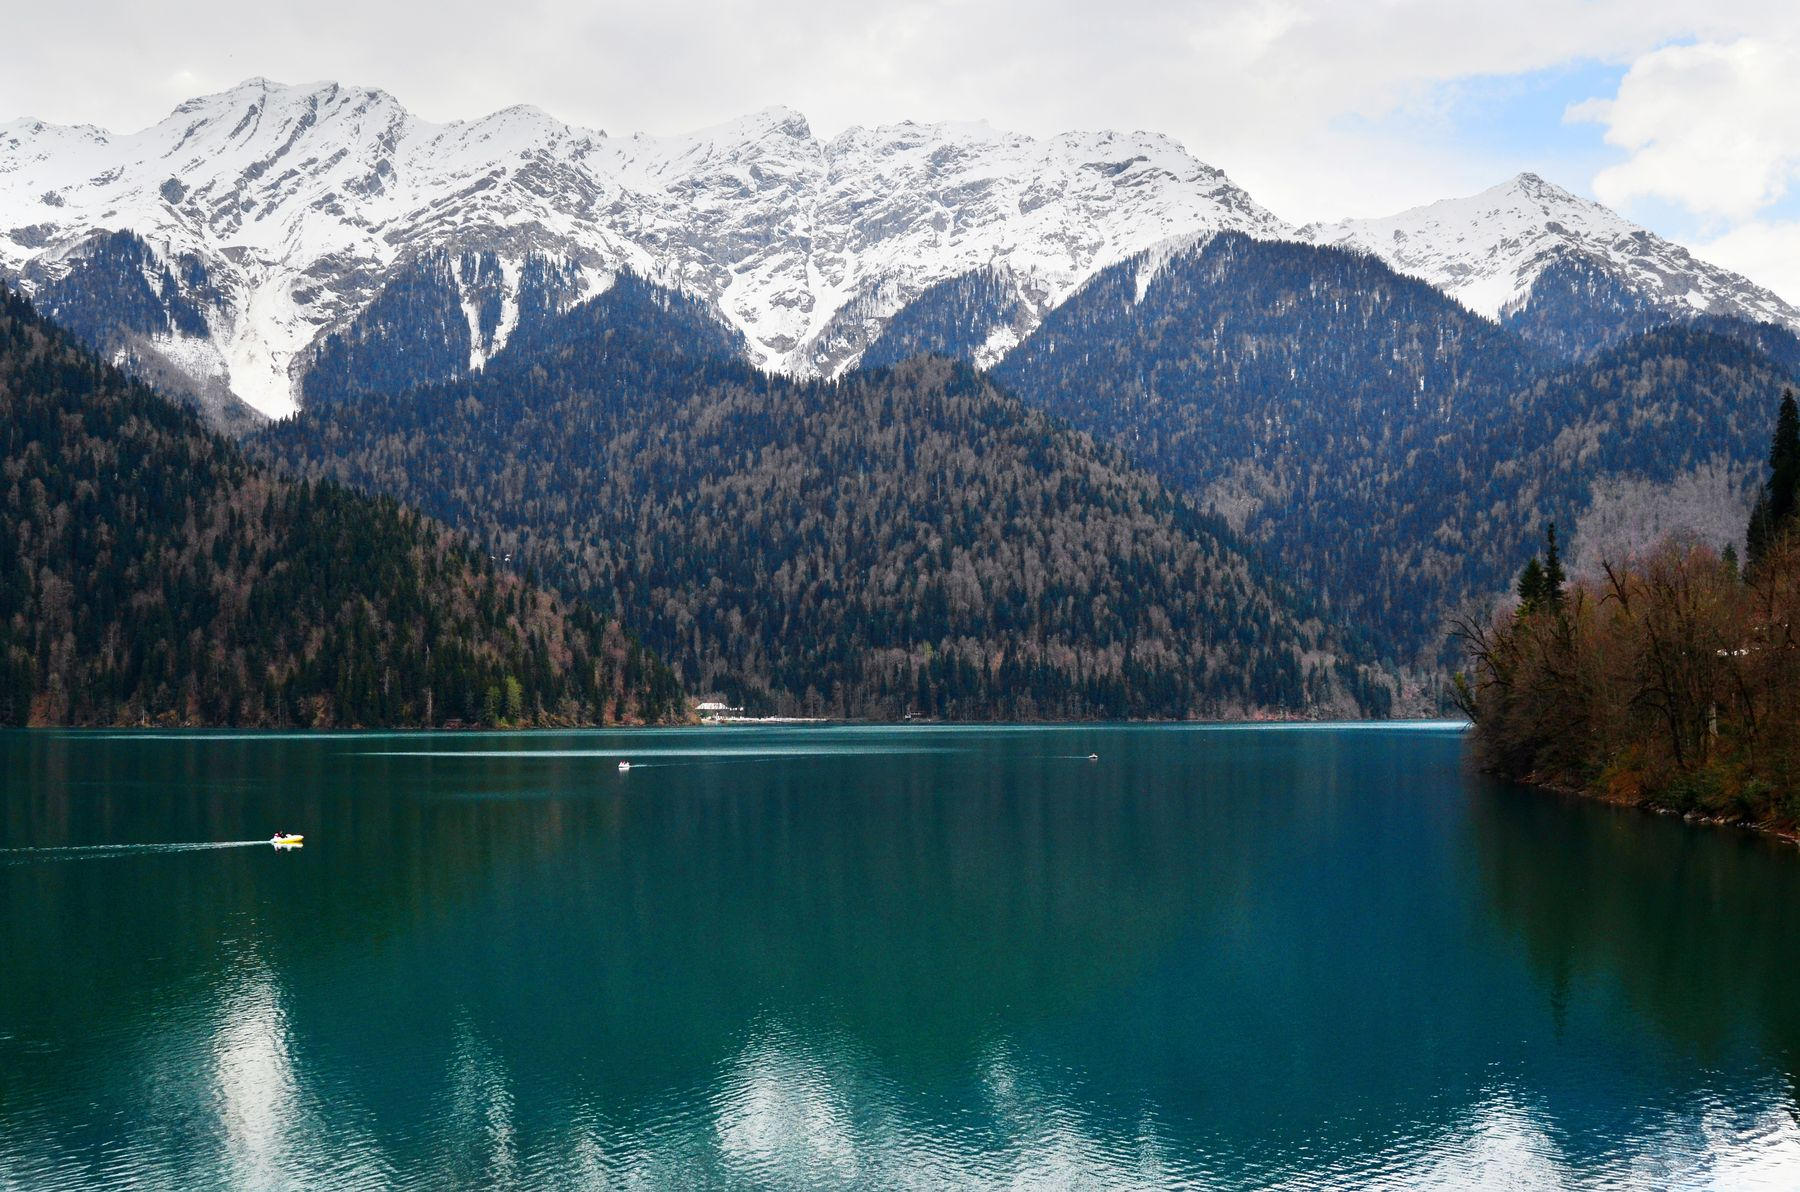 Из Сочи на машине. Озеро Рица в Абхазии